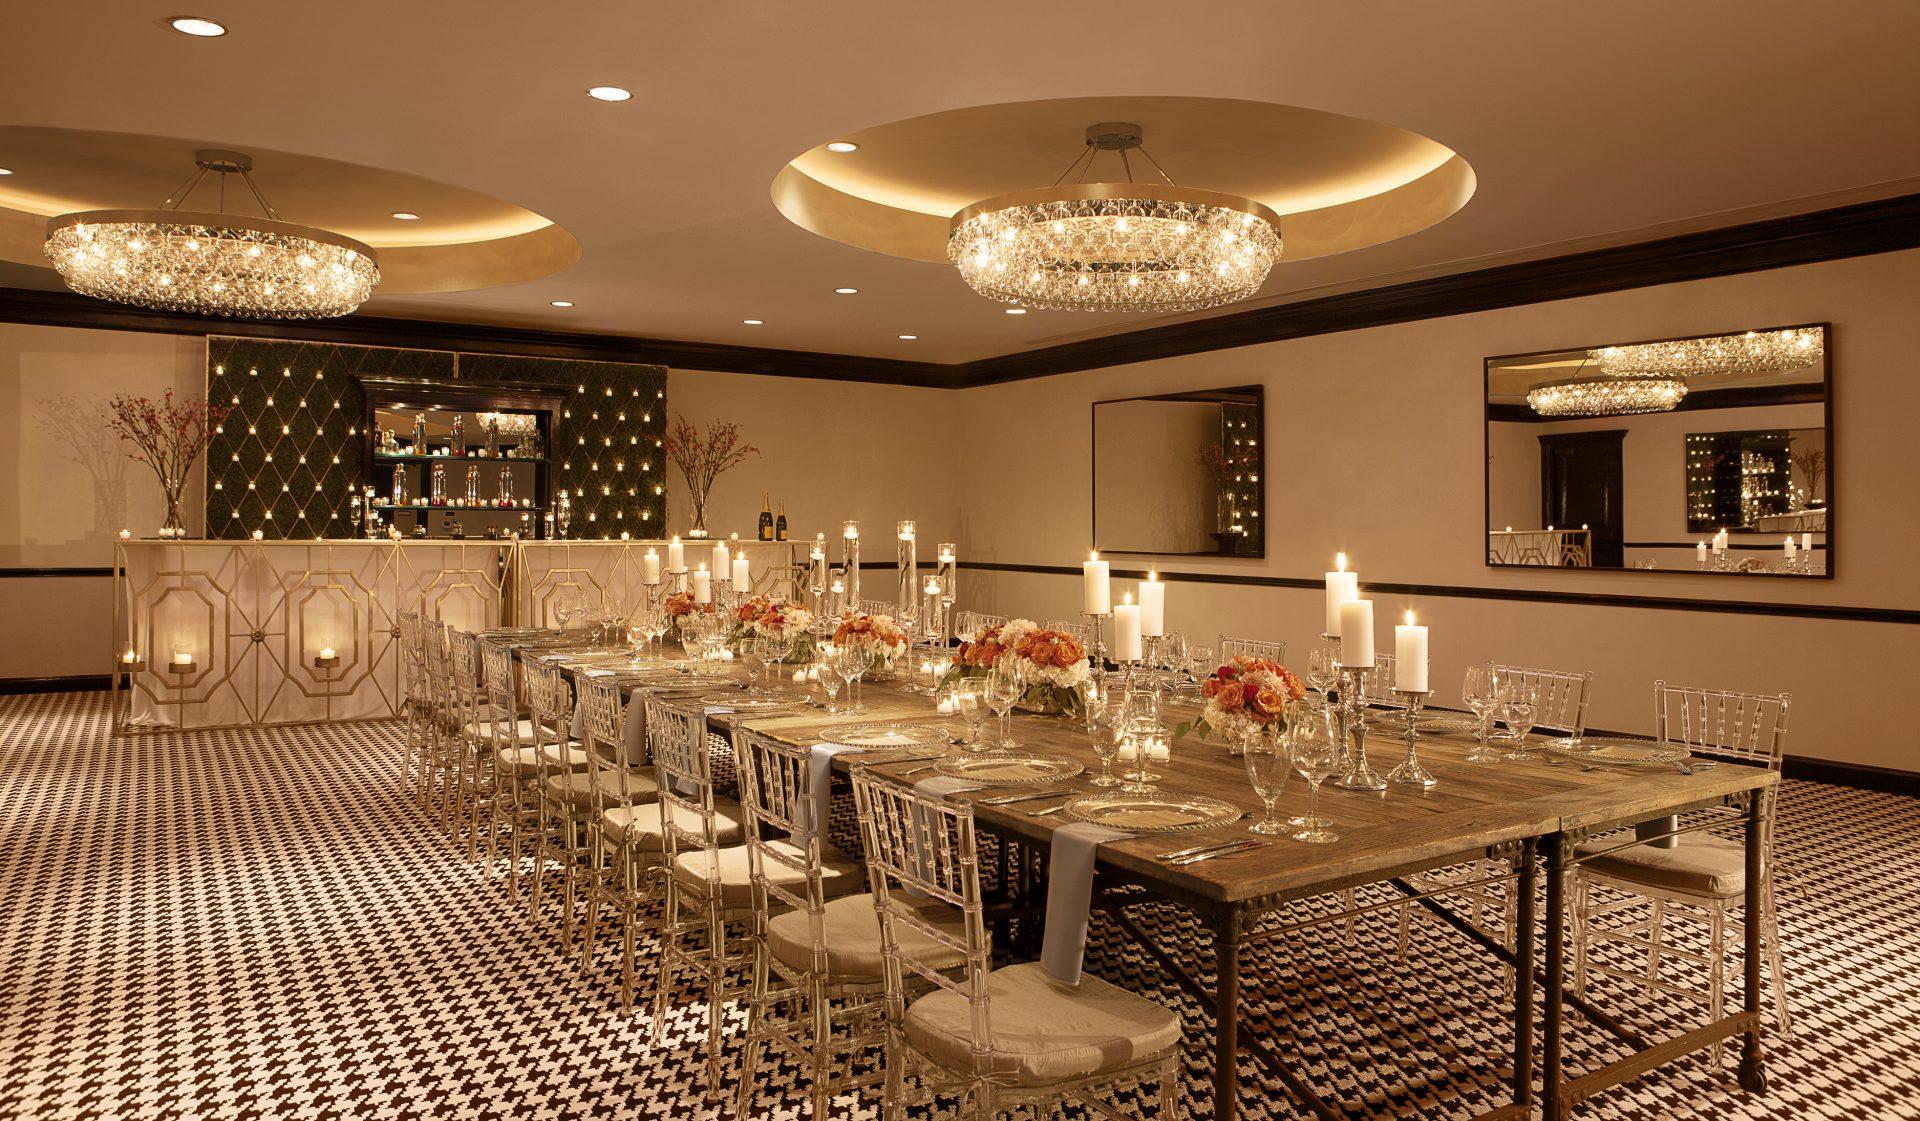 Hotel Zaza Dallas Metropolitan Ballroom Partyslate